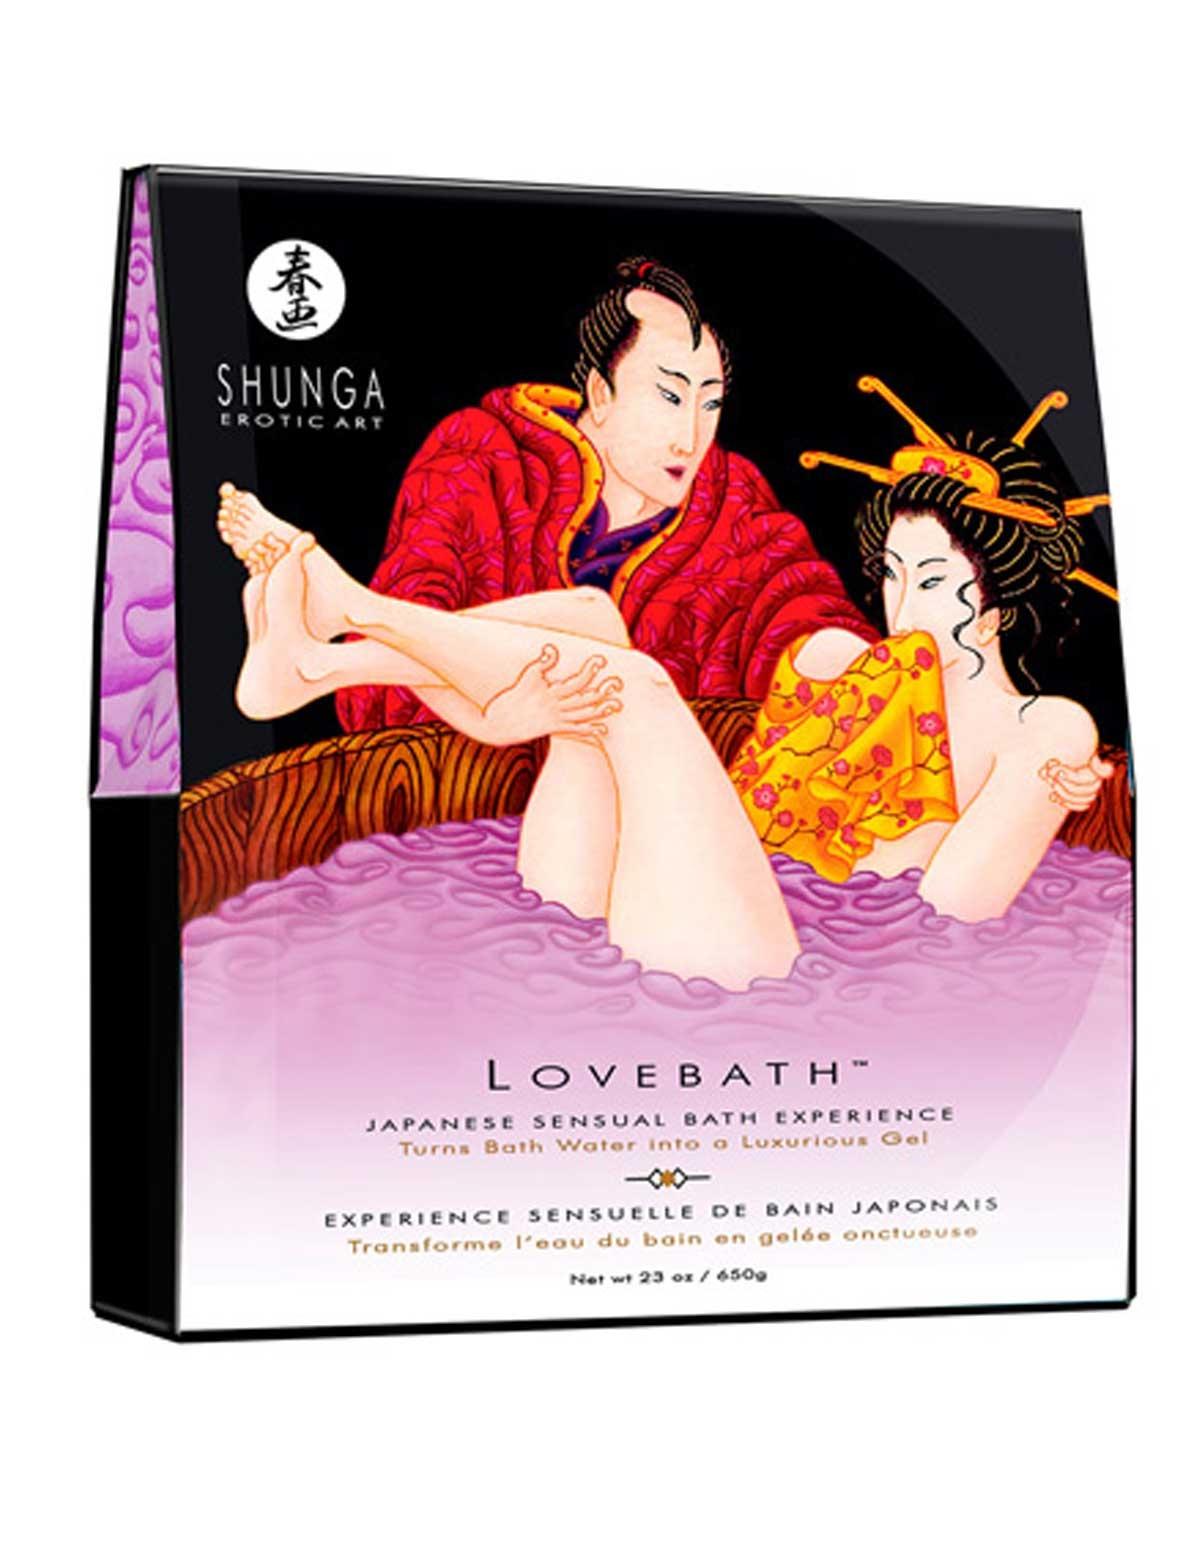 Sensual Lotus Lovebath Bath Gel